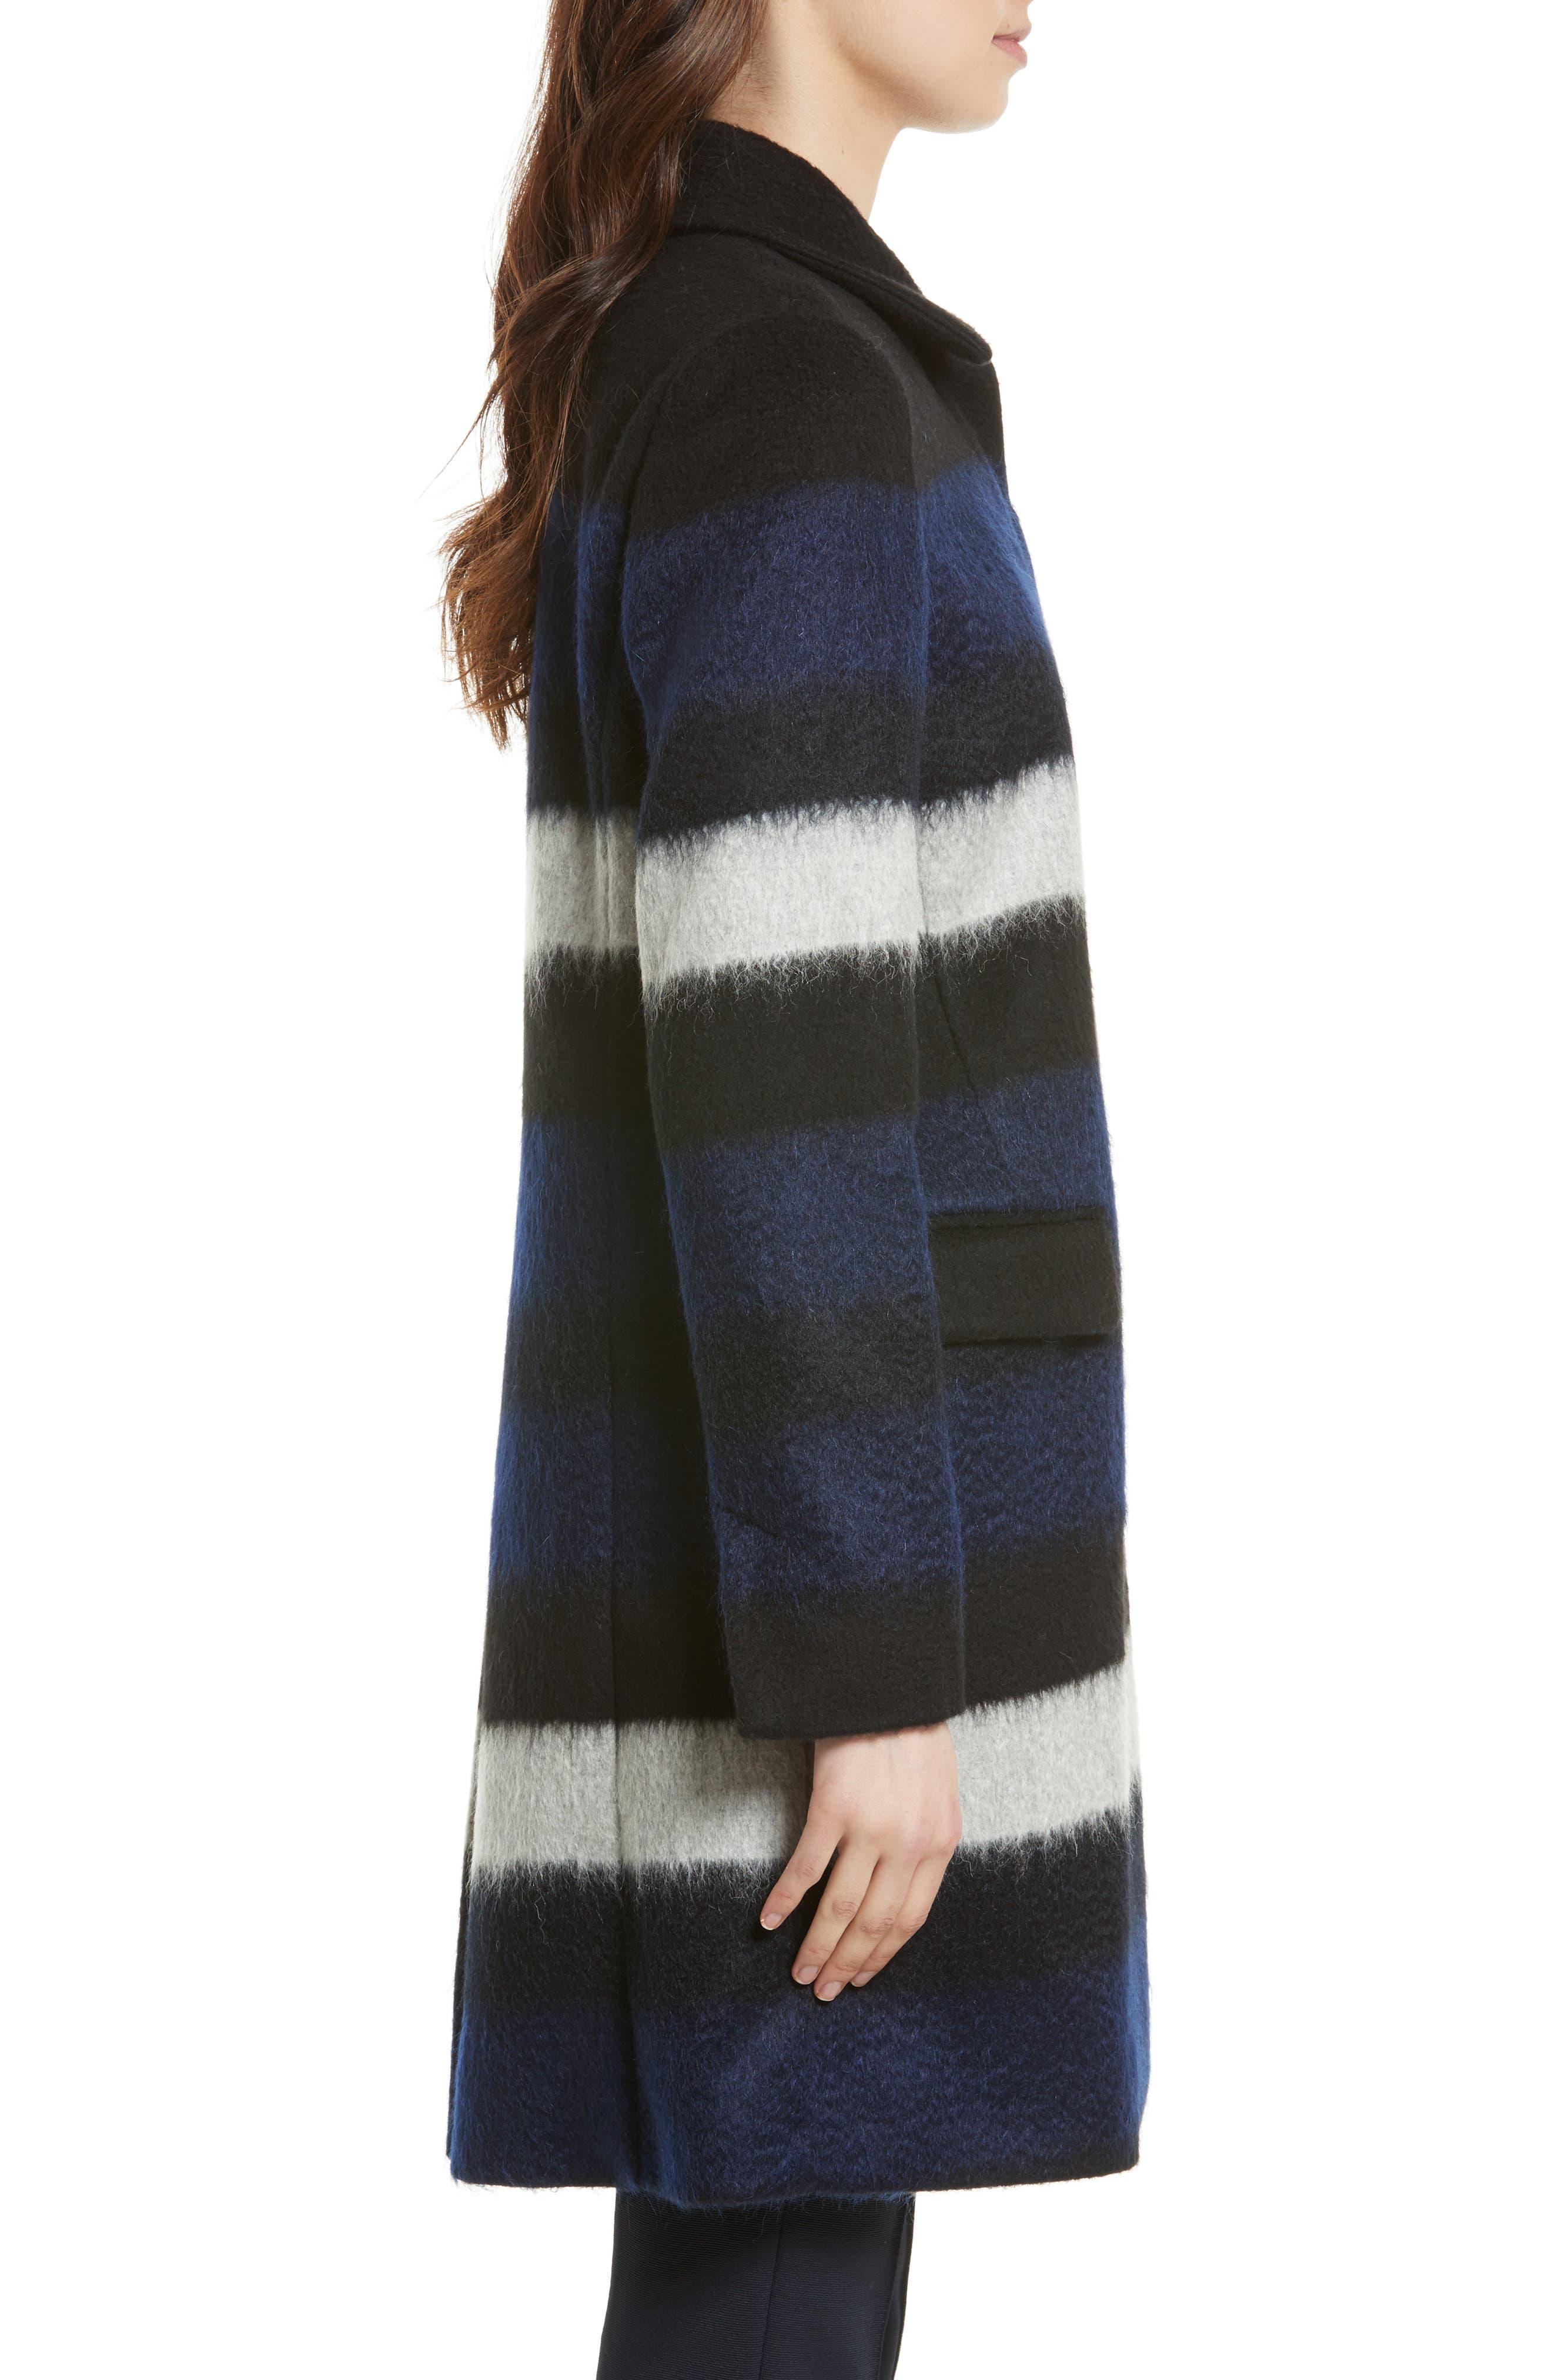 DIANE VON FURSTENBERG,                             Stripe Wool Blend Coat,                             Alternate thumbnail 3, color,                             005